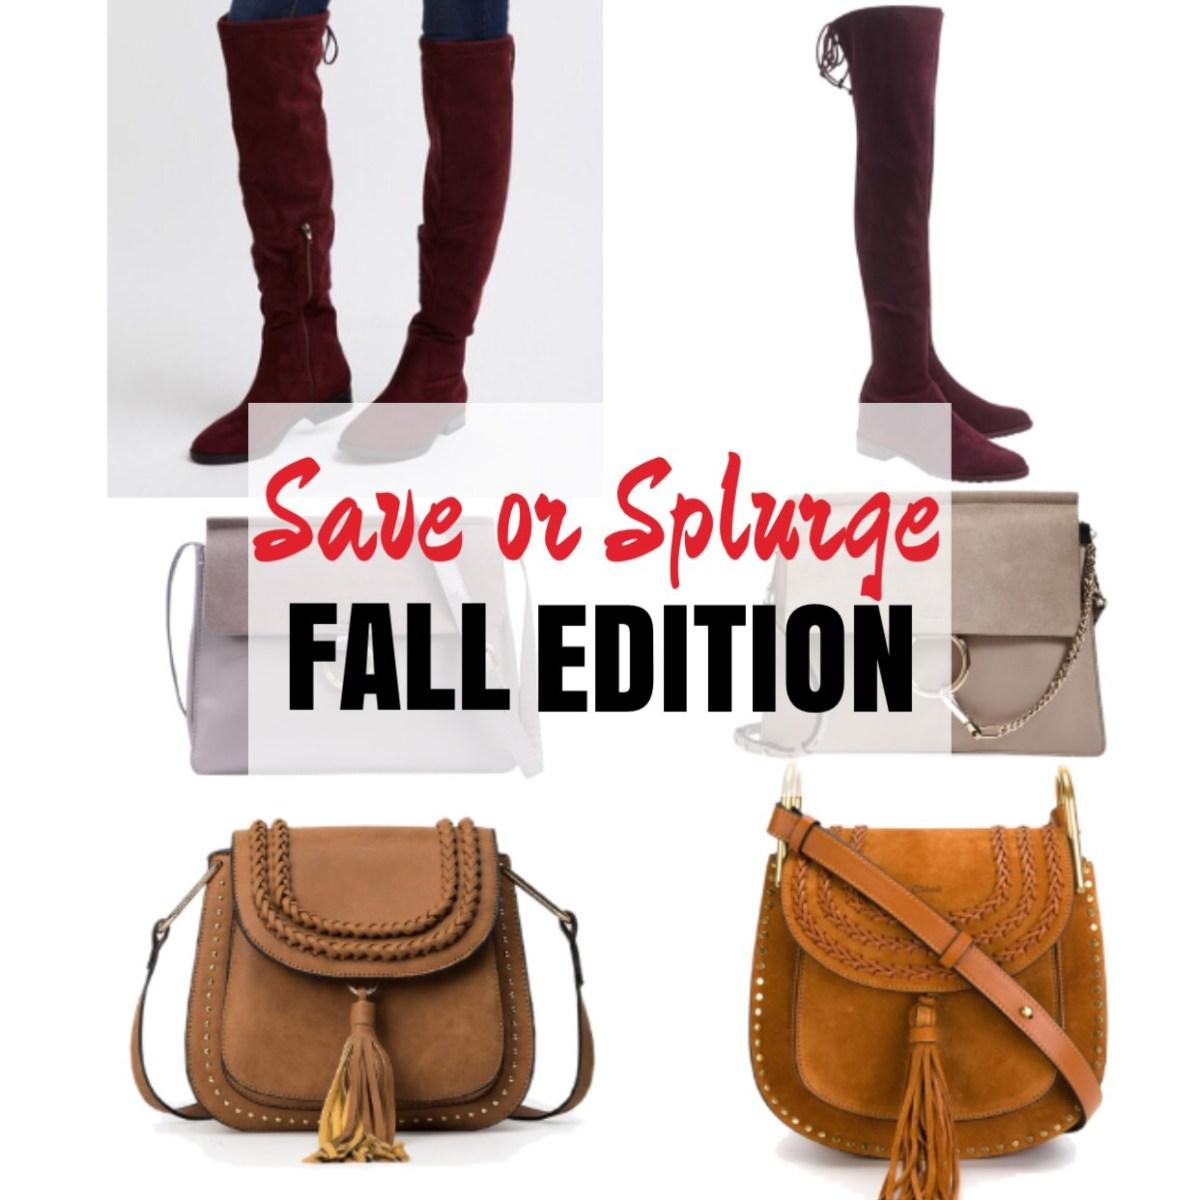 Fall Edition Save vs Splurge